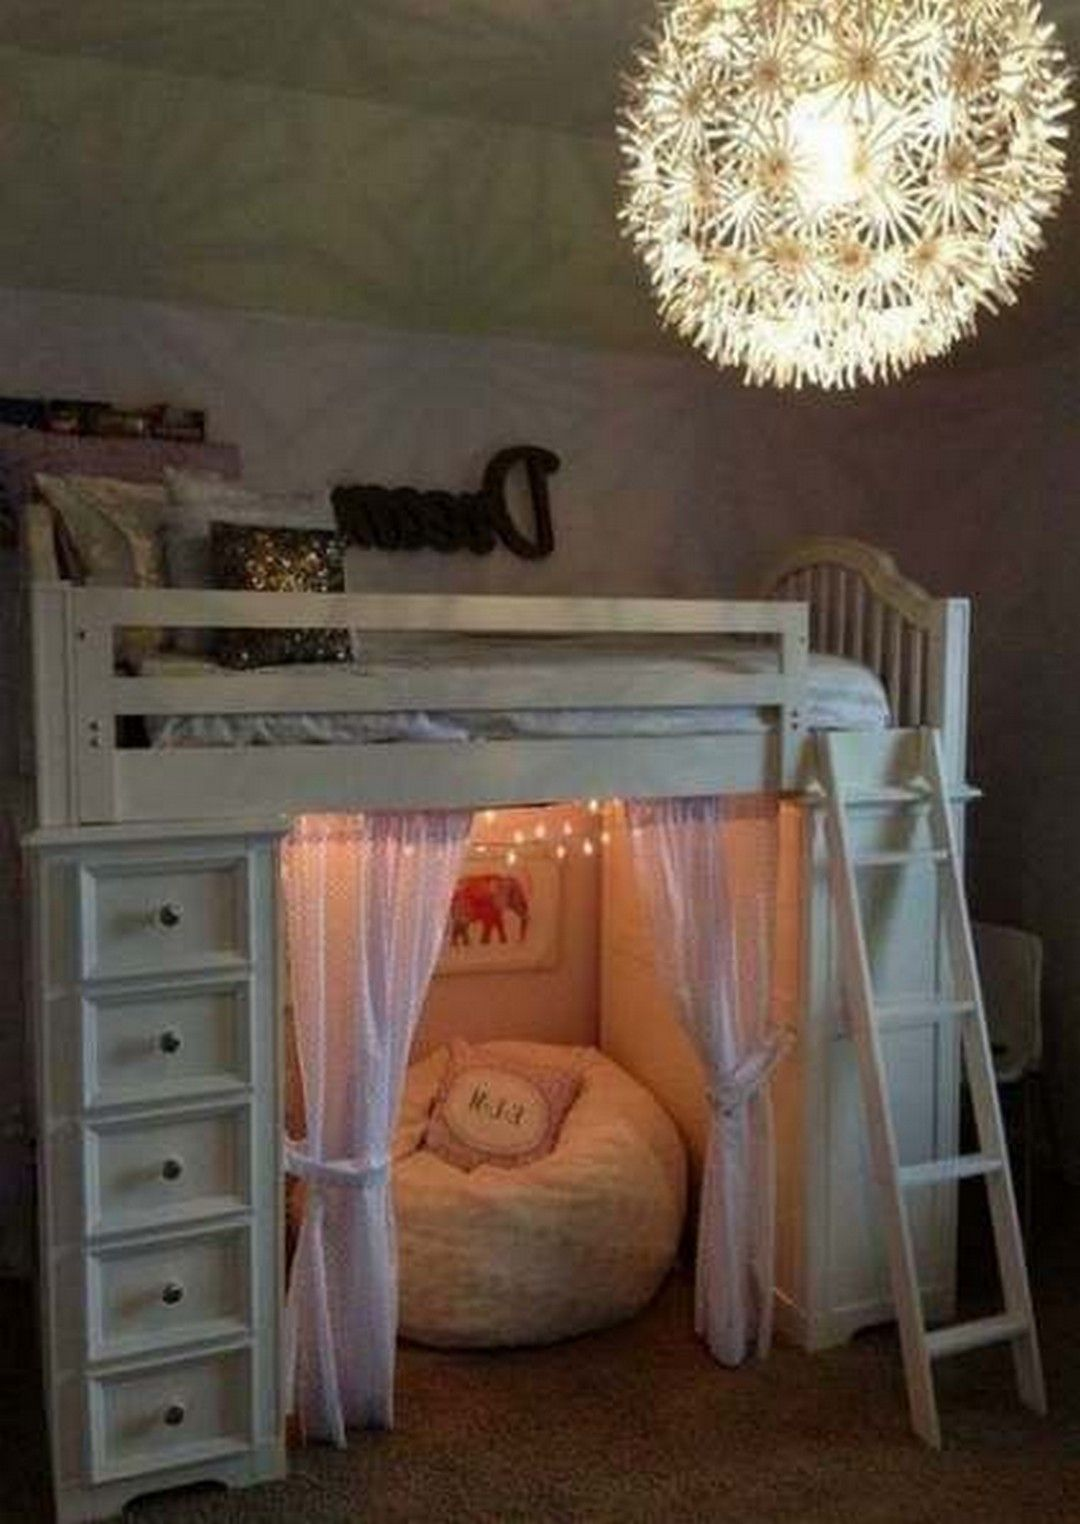 55 Creative Ways Dream Rooms For Teens Bedrooms Small Spaces House Living Tween Bedroom Decor Girls Loft Bed Small Room Girl